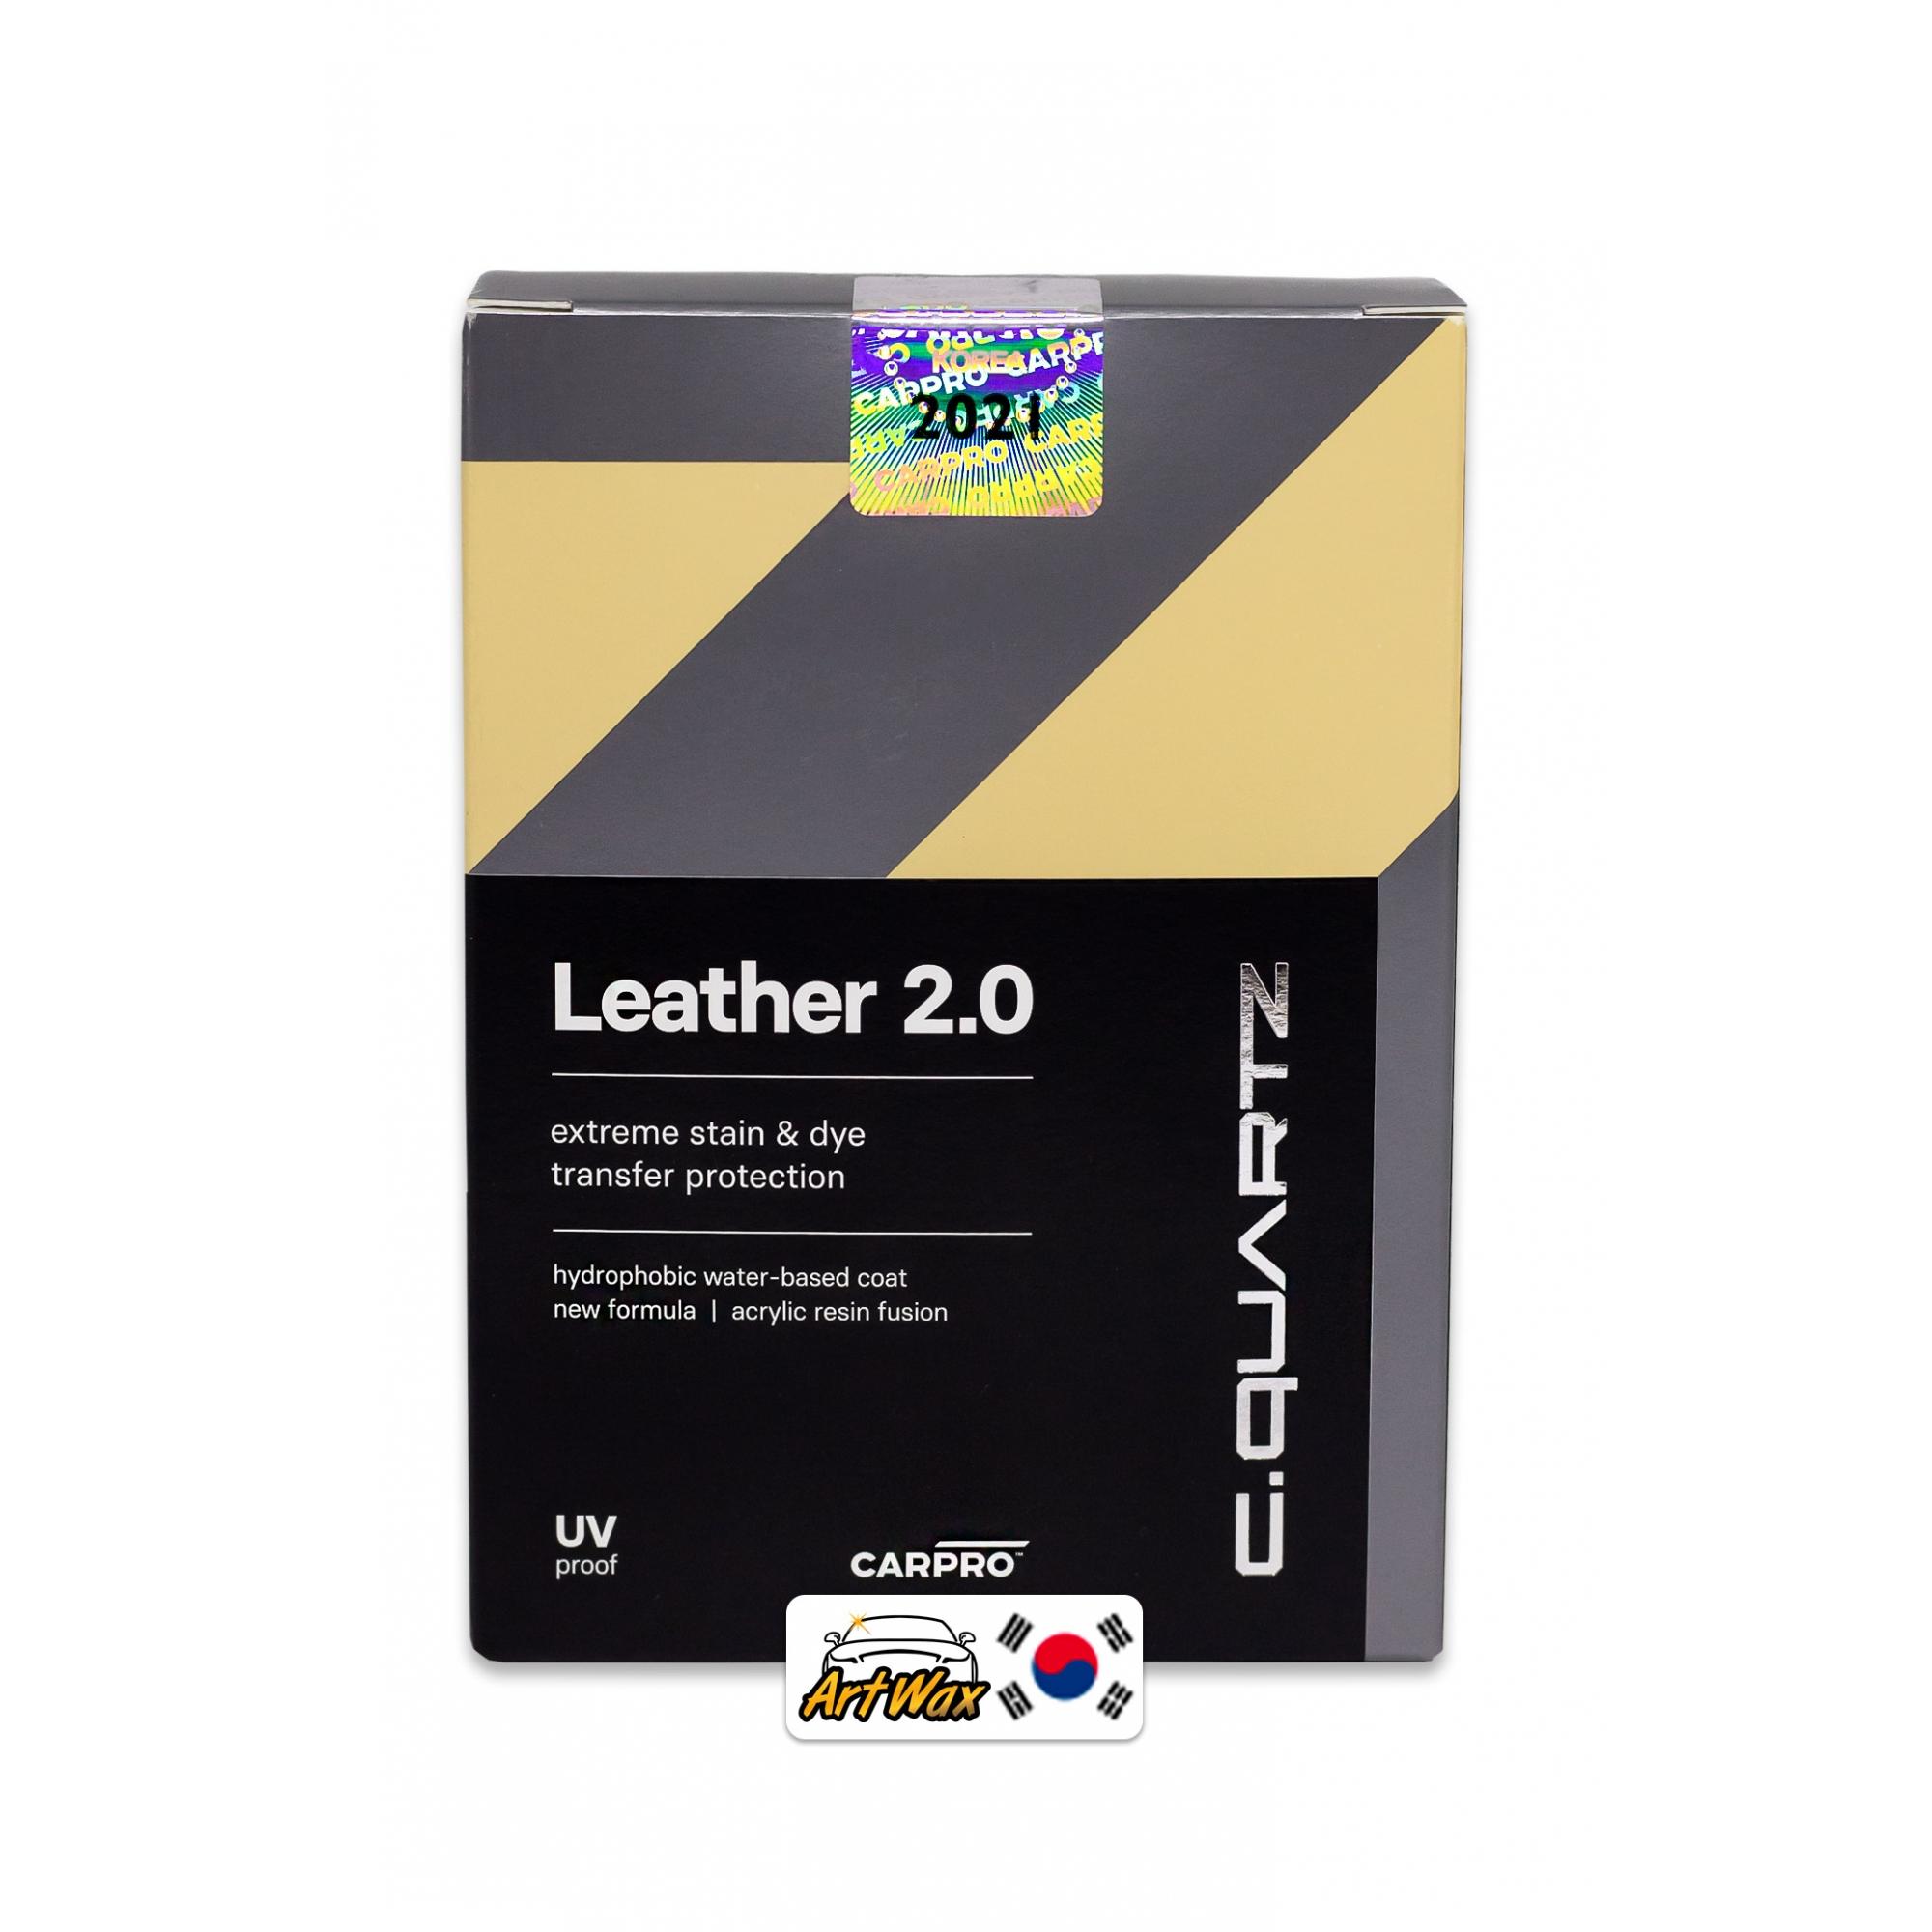 Carpro Leather 2.0 30ml - Revestimento Para Couro Base D'Água